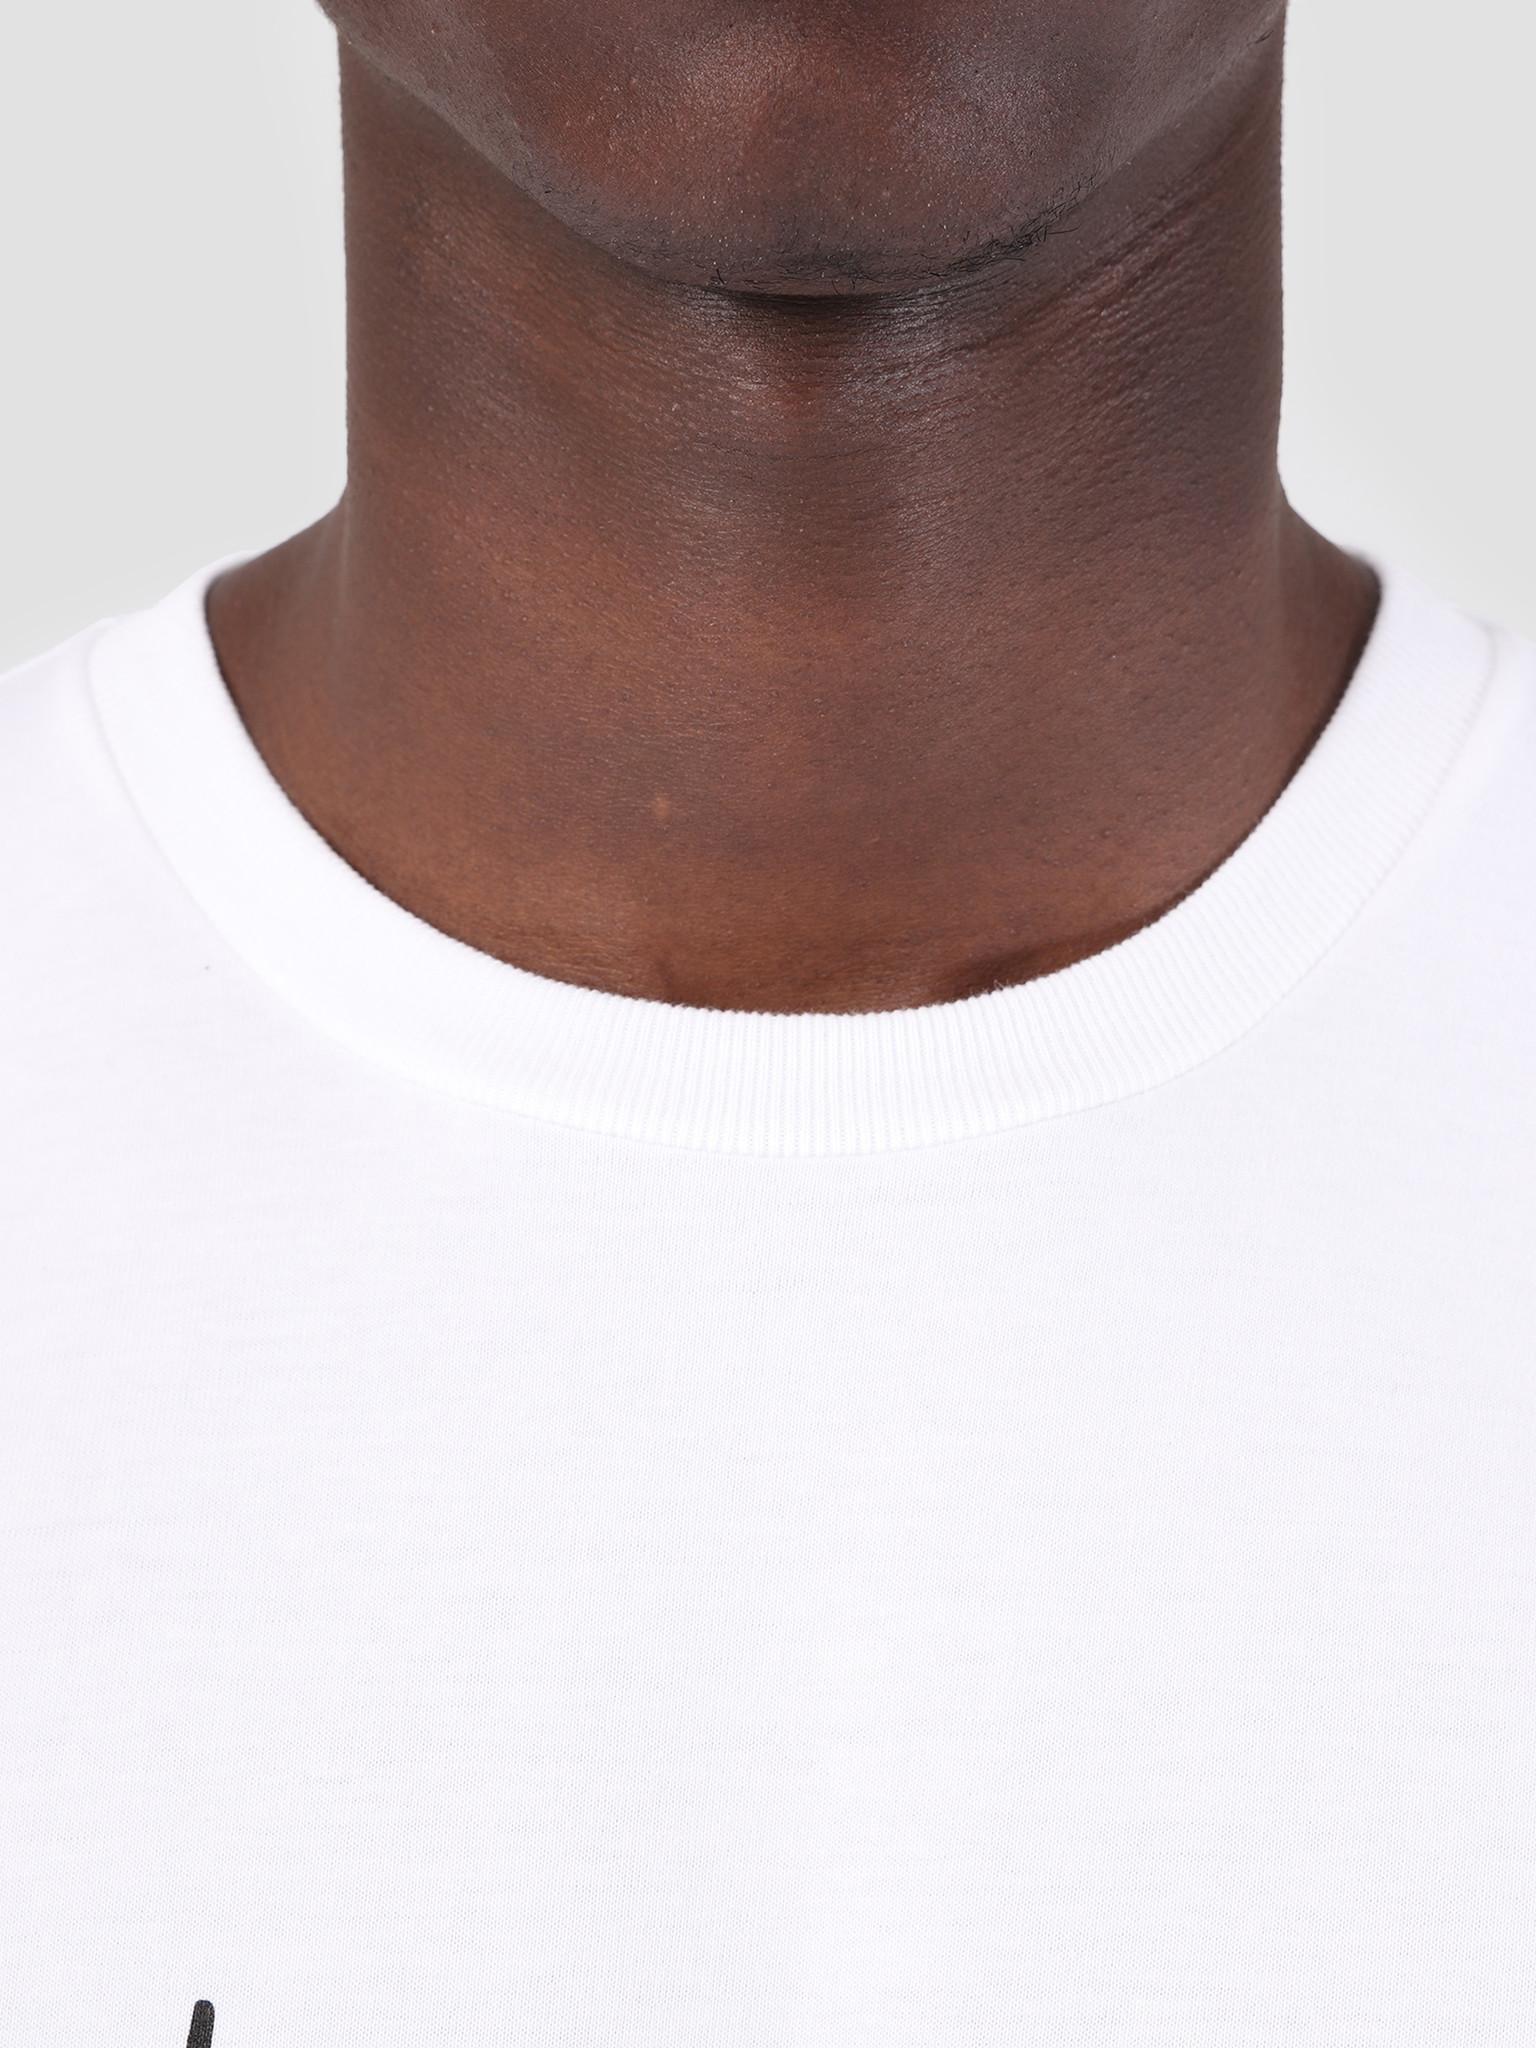 Carhartt WIP Carhartt WIP x FRESHCOTTON Dr. Rat Longsleeve White Gold I028084